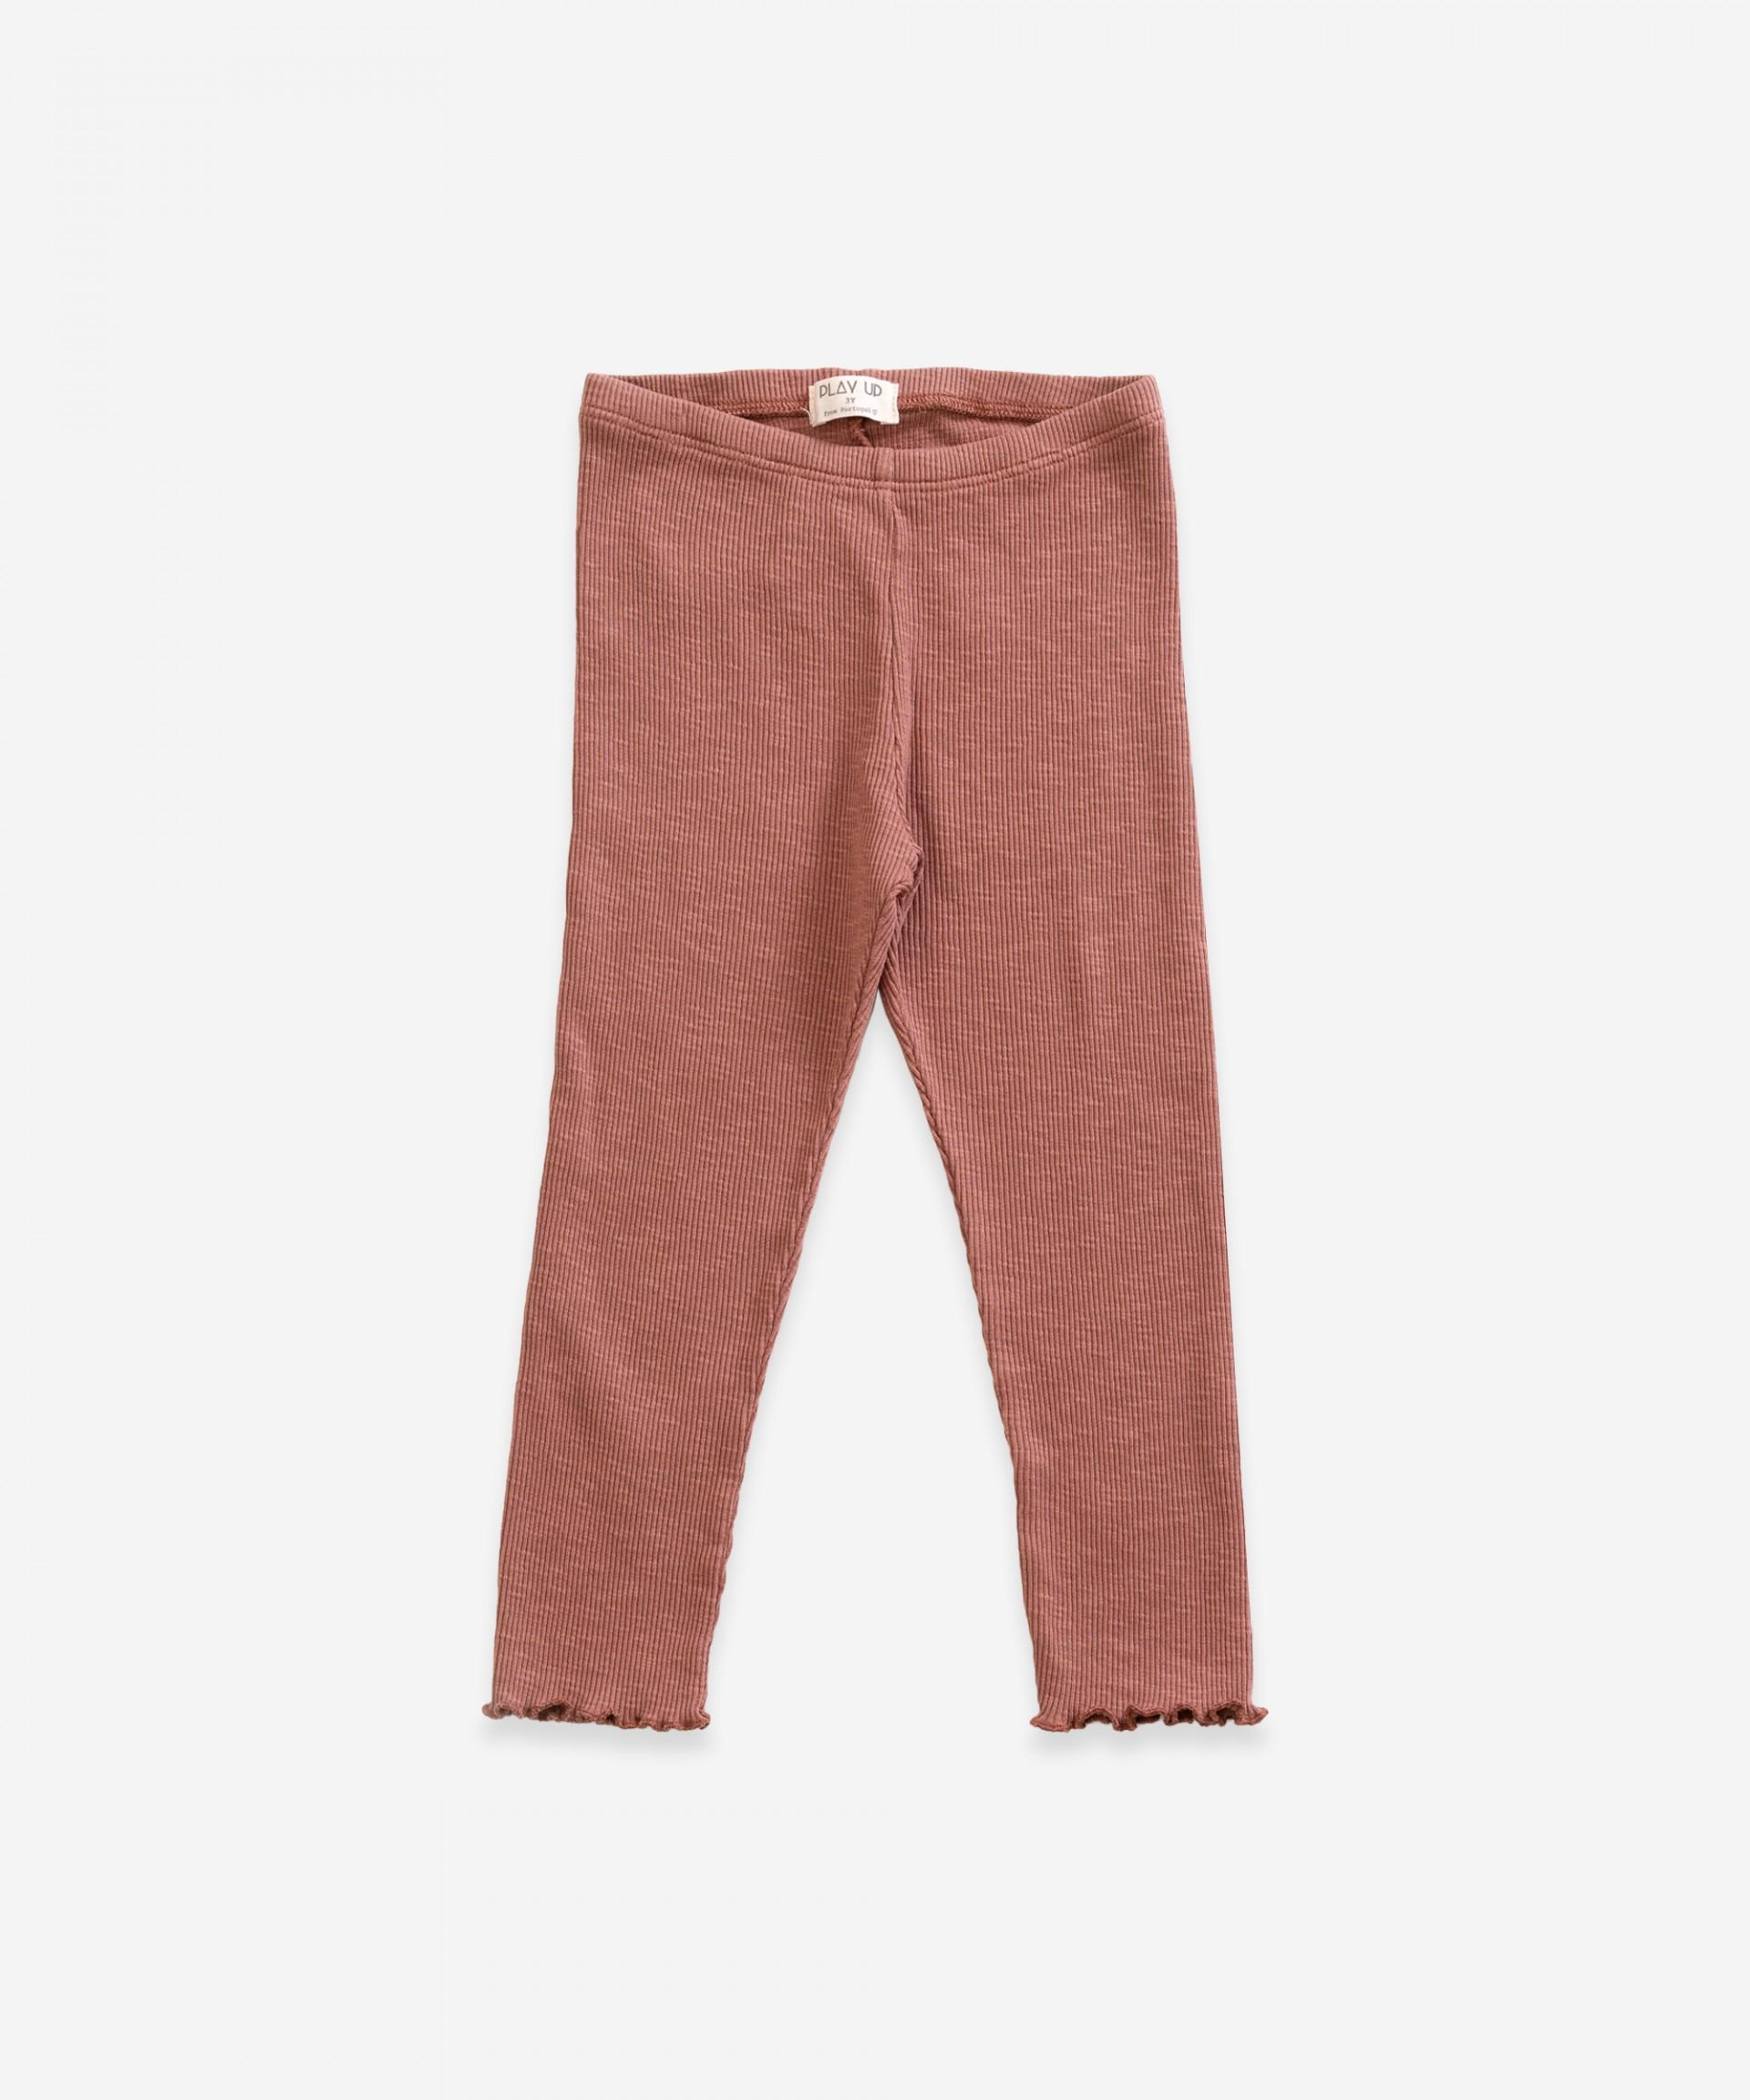 Legging de malha com cintura elástica | Weaving